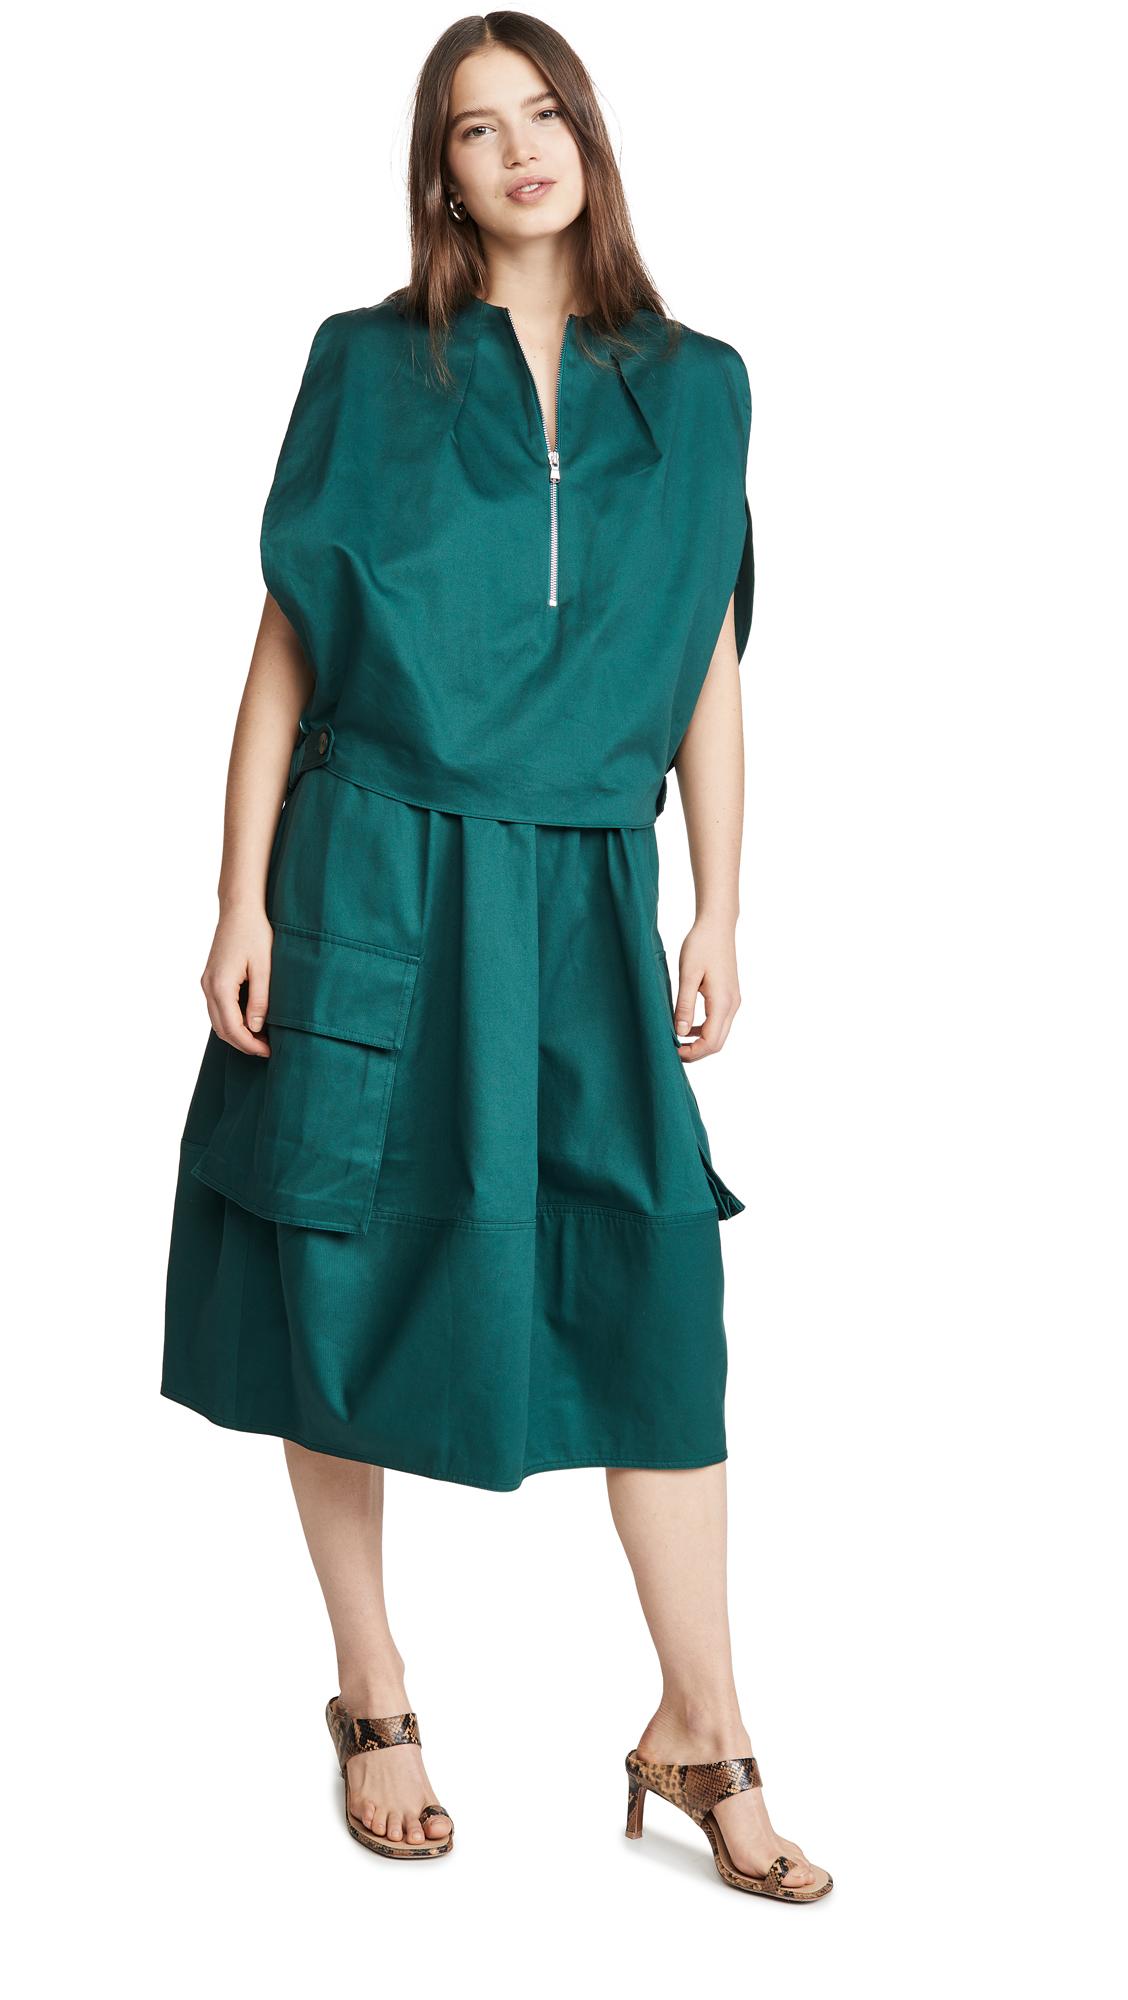 Tibi Balloon Dress – 30% Off Sale